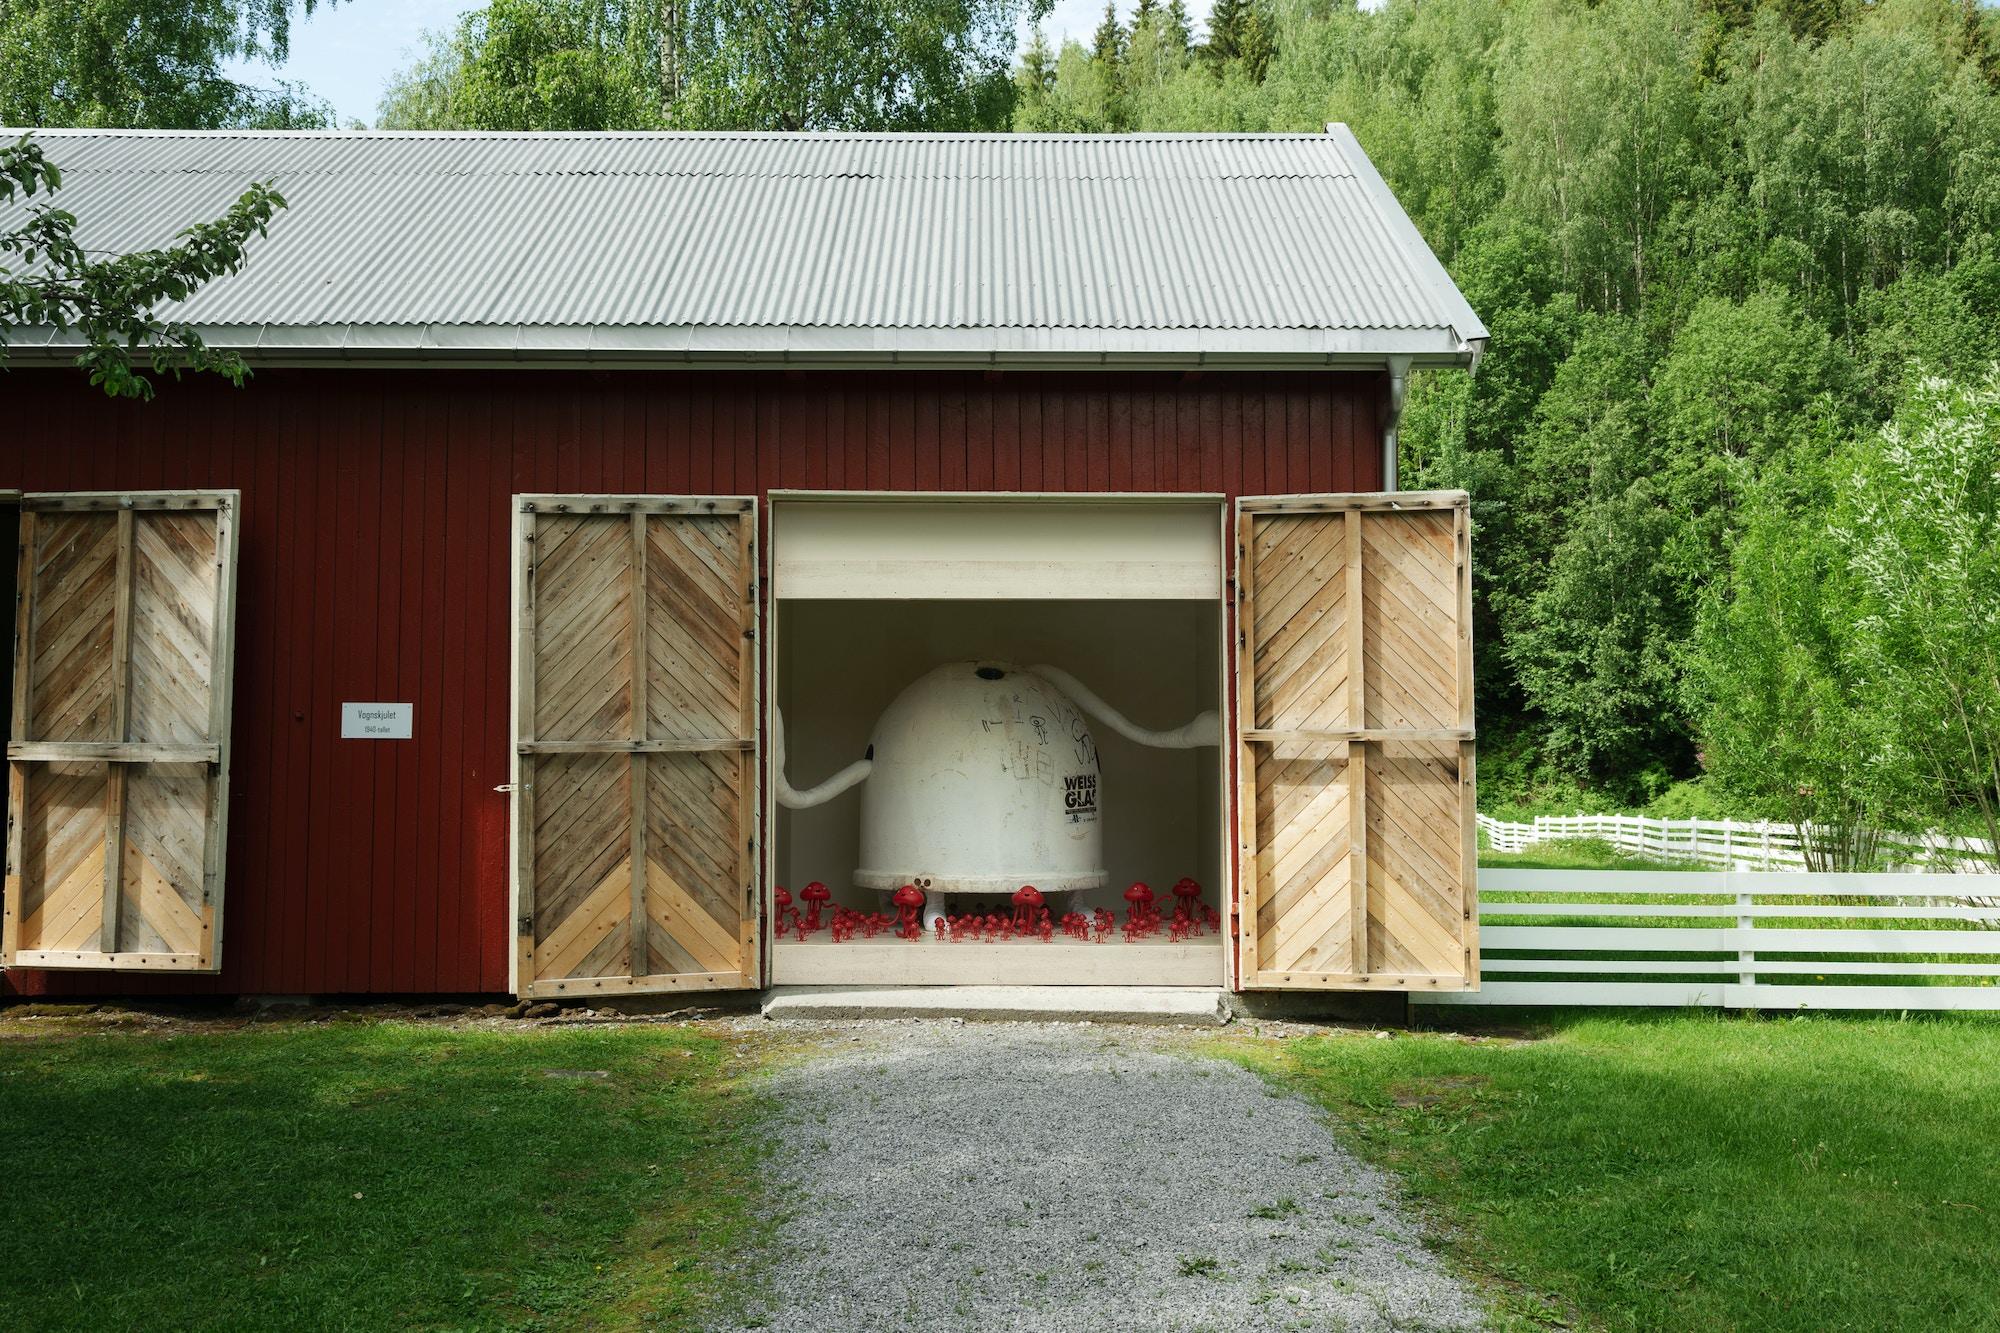 Installation, red house, glass window, art-sculptures.